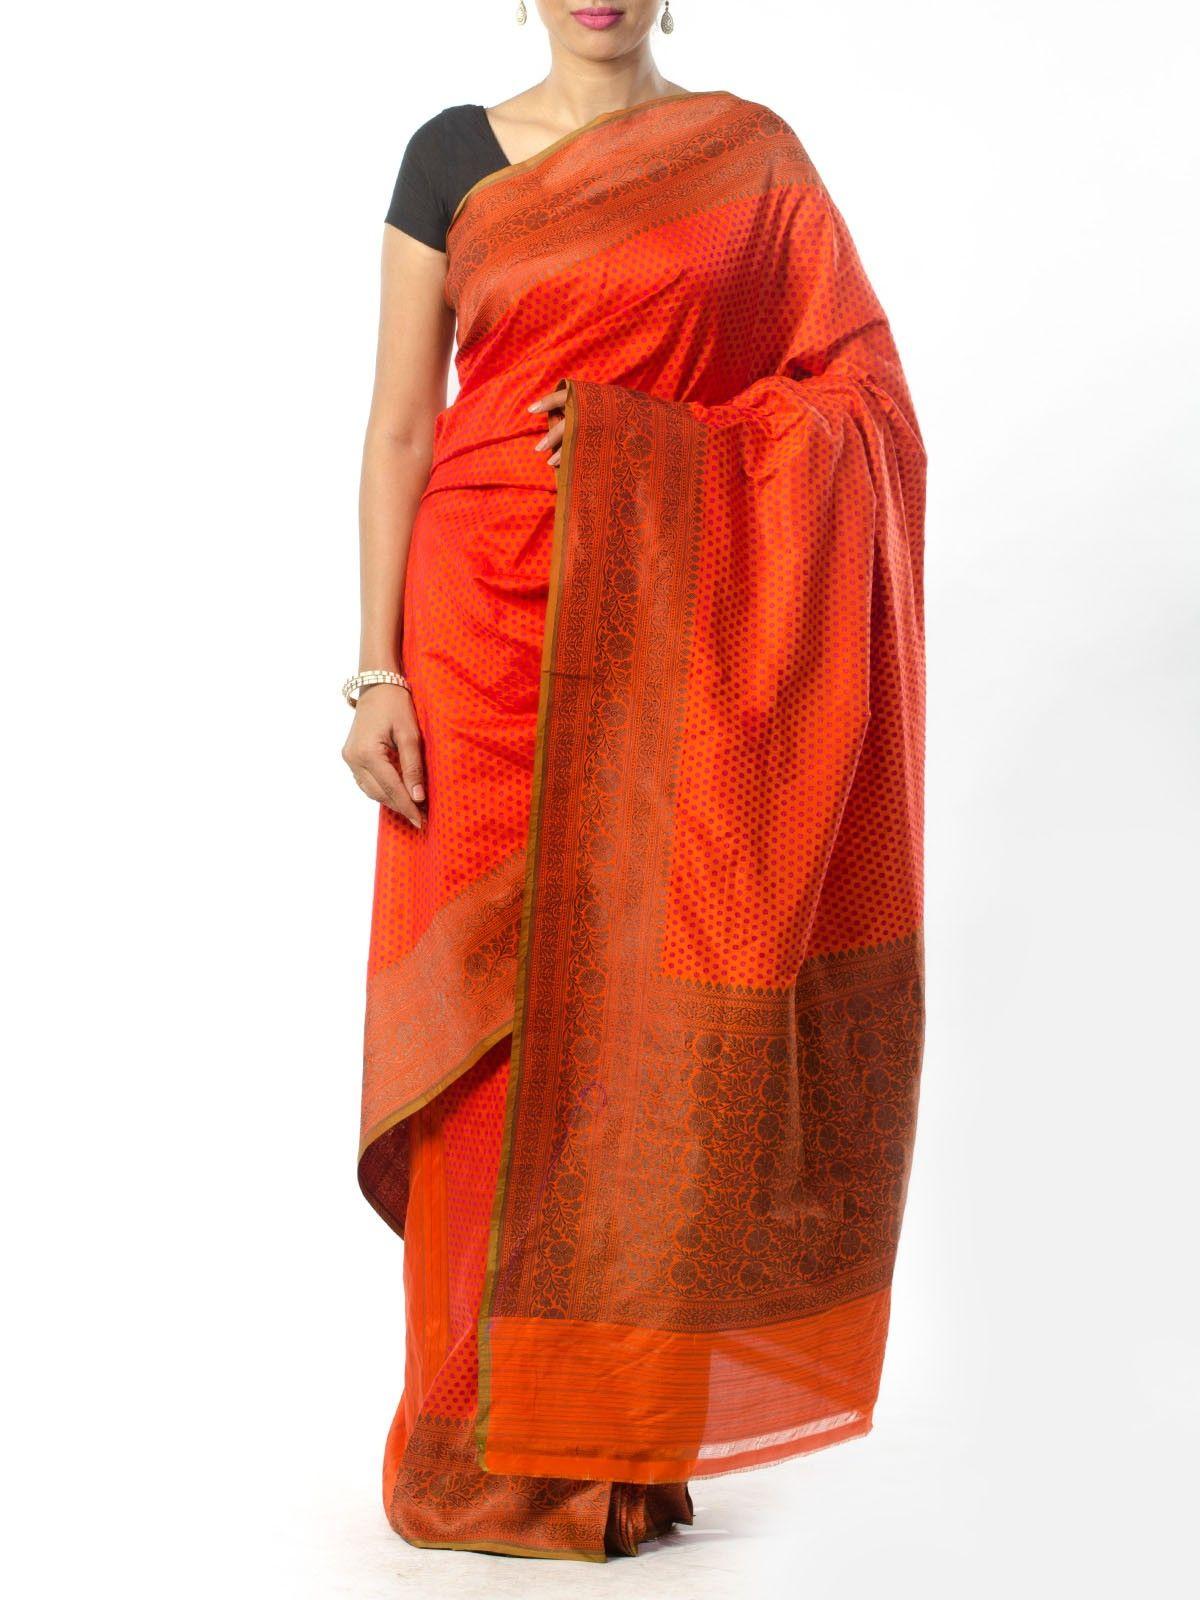 Orange Banarasi Saree with Resham Work